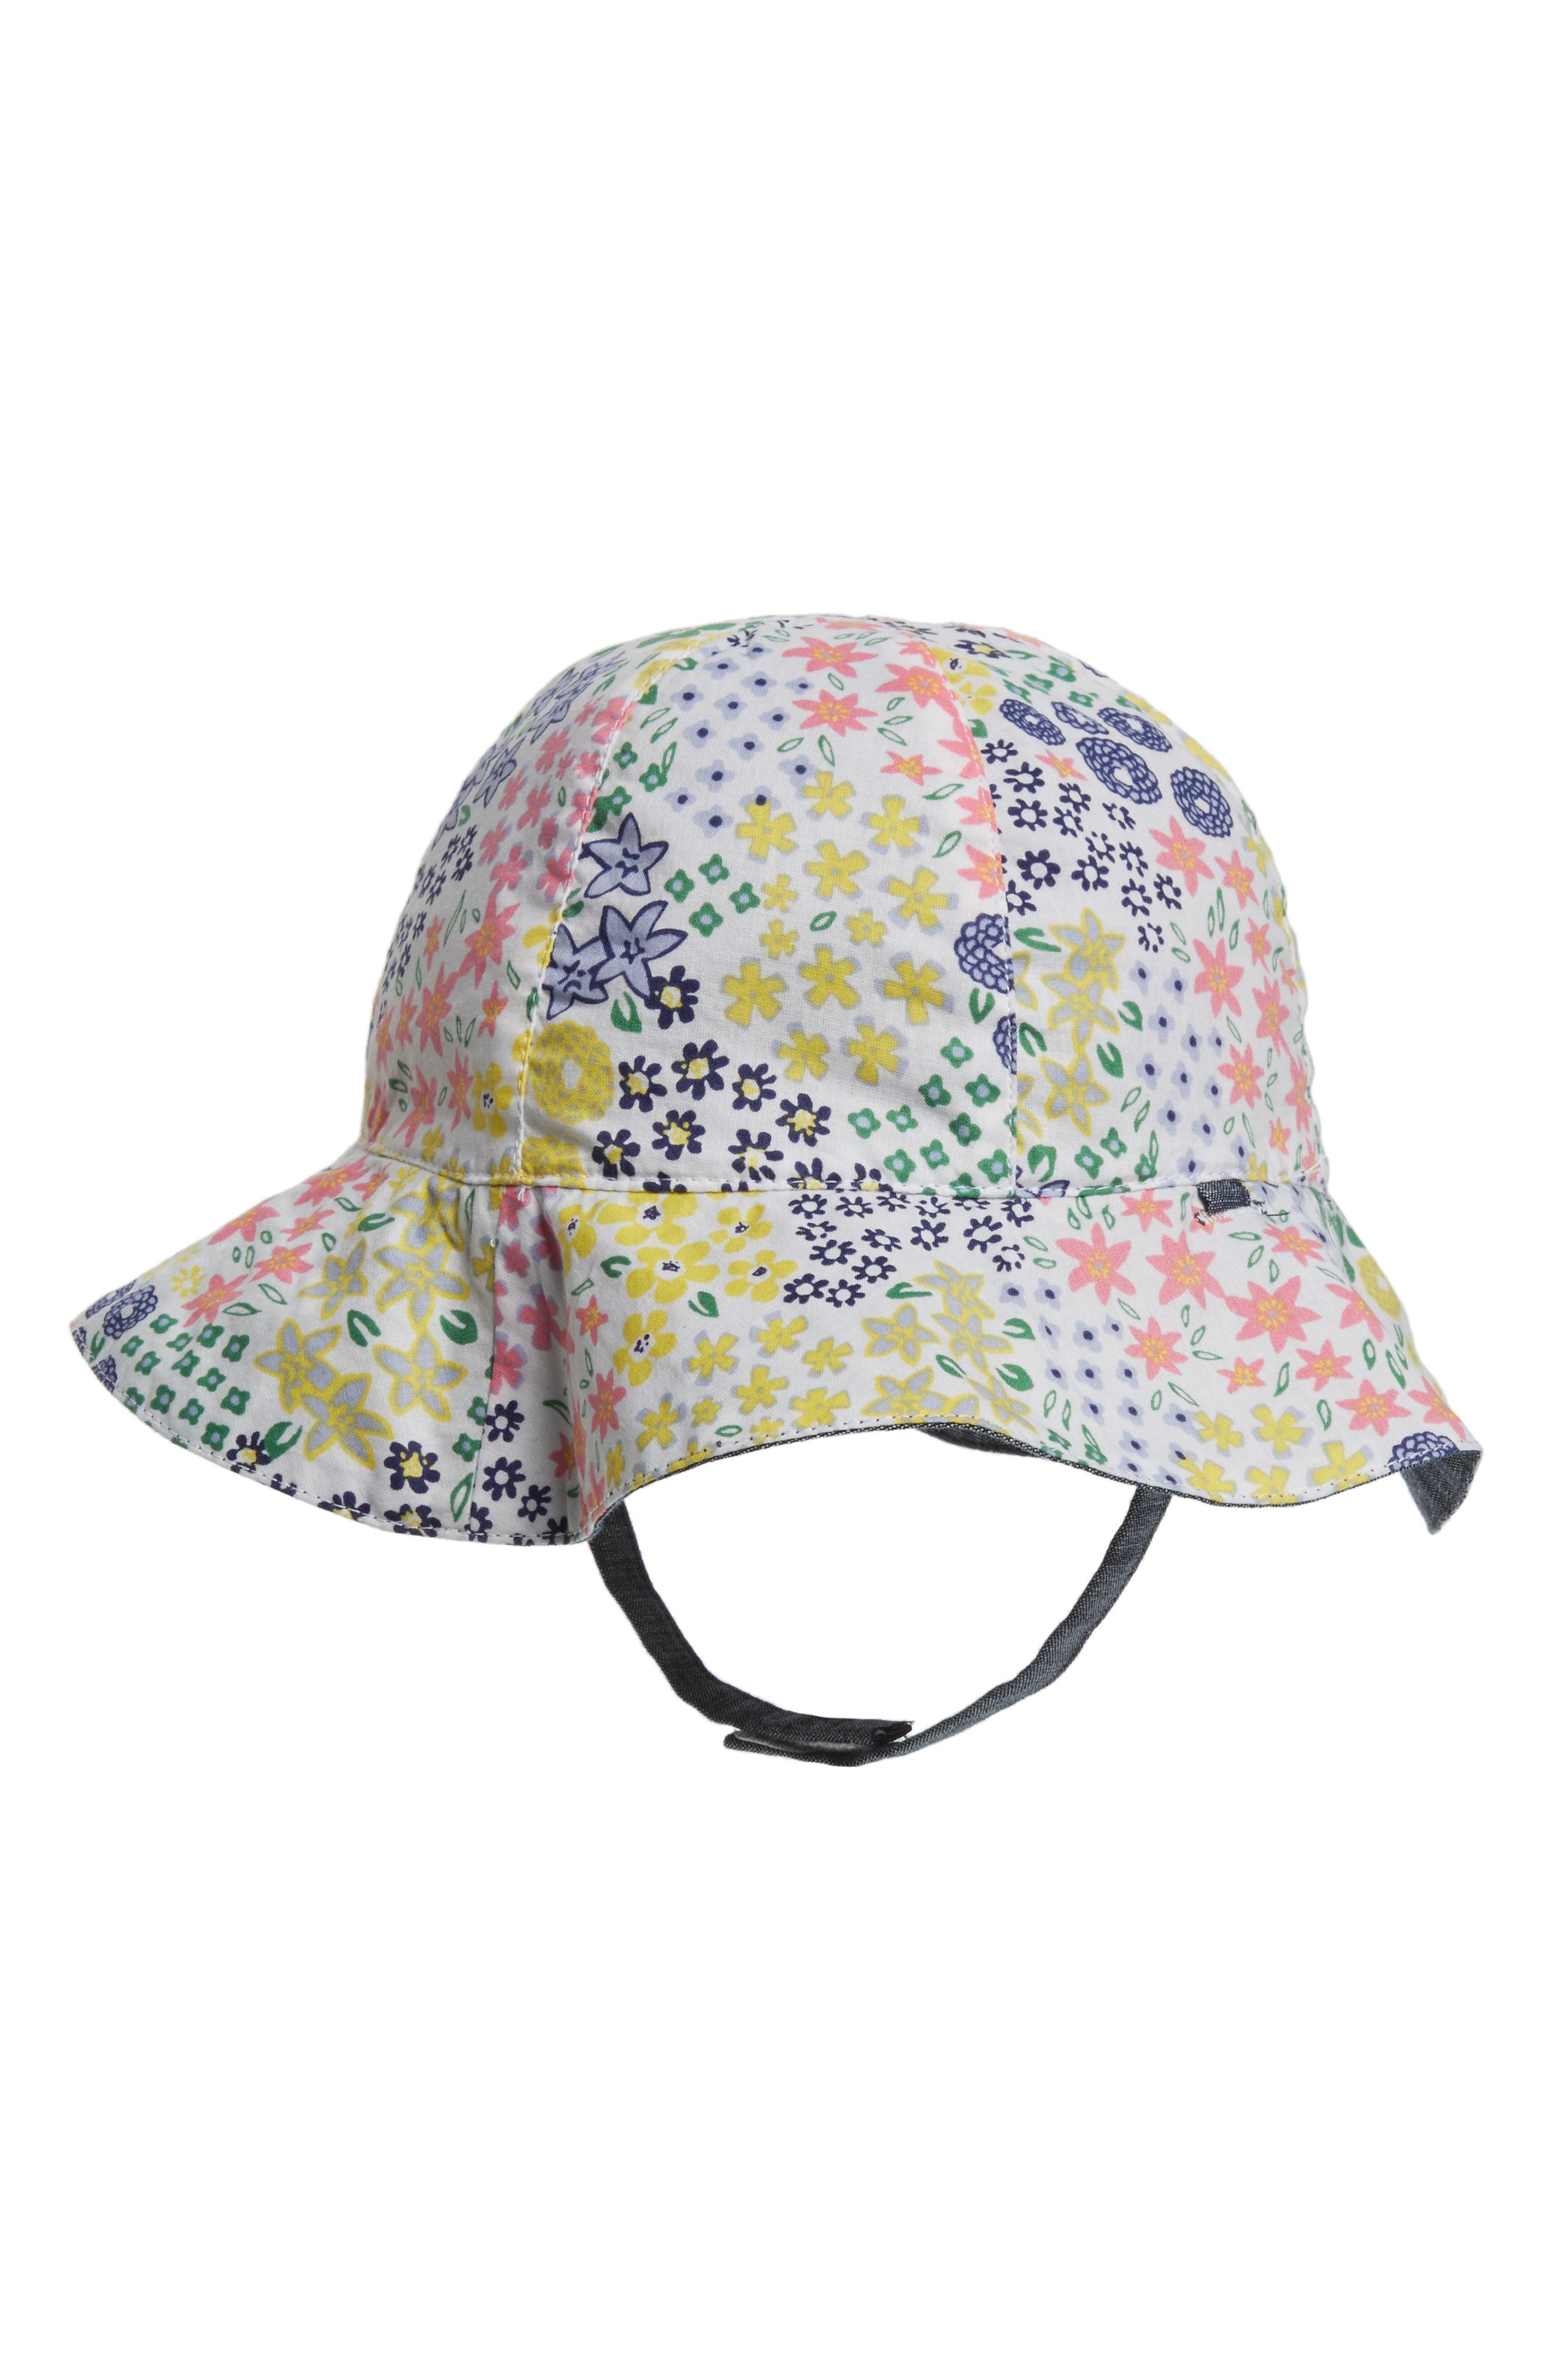 Reversible Sun Hat,                             Alternate thumbnail 2, color,                             WHITE MULTI MEADOW